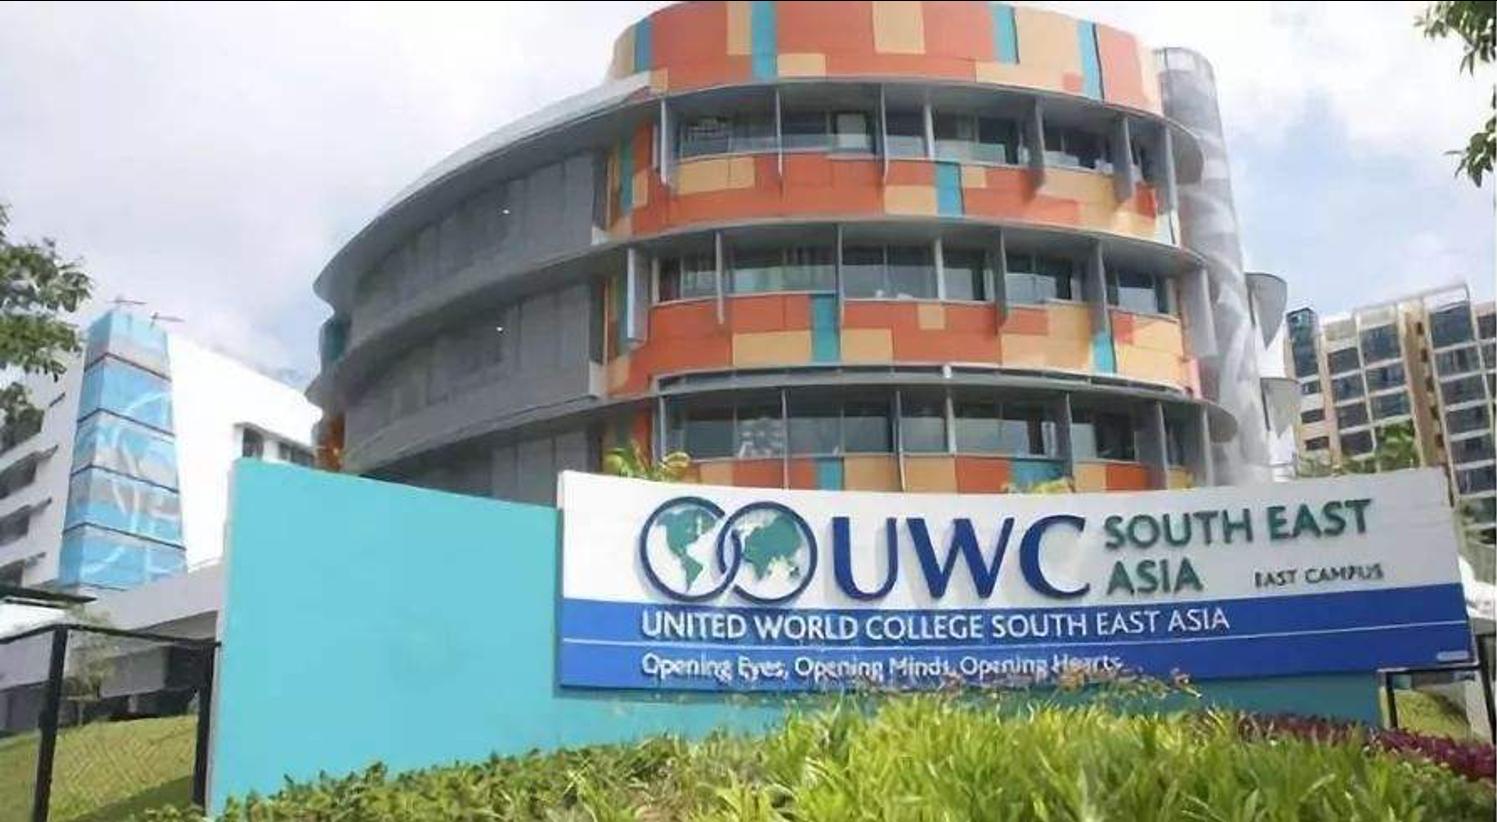 Singapore UWC south east asia school 东南亚世界联合书院